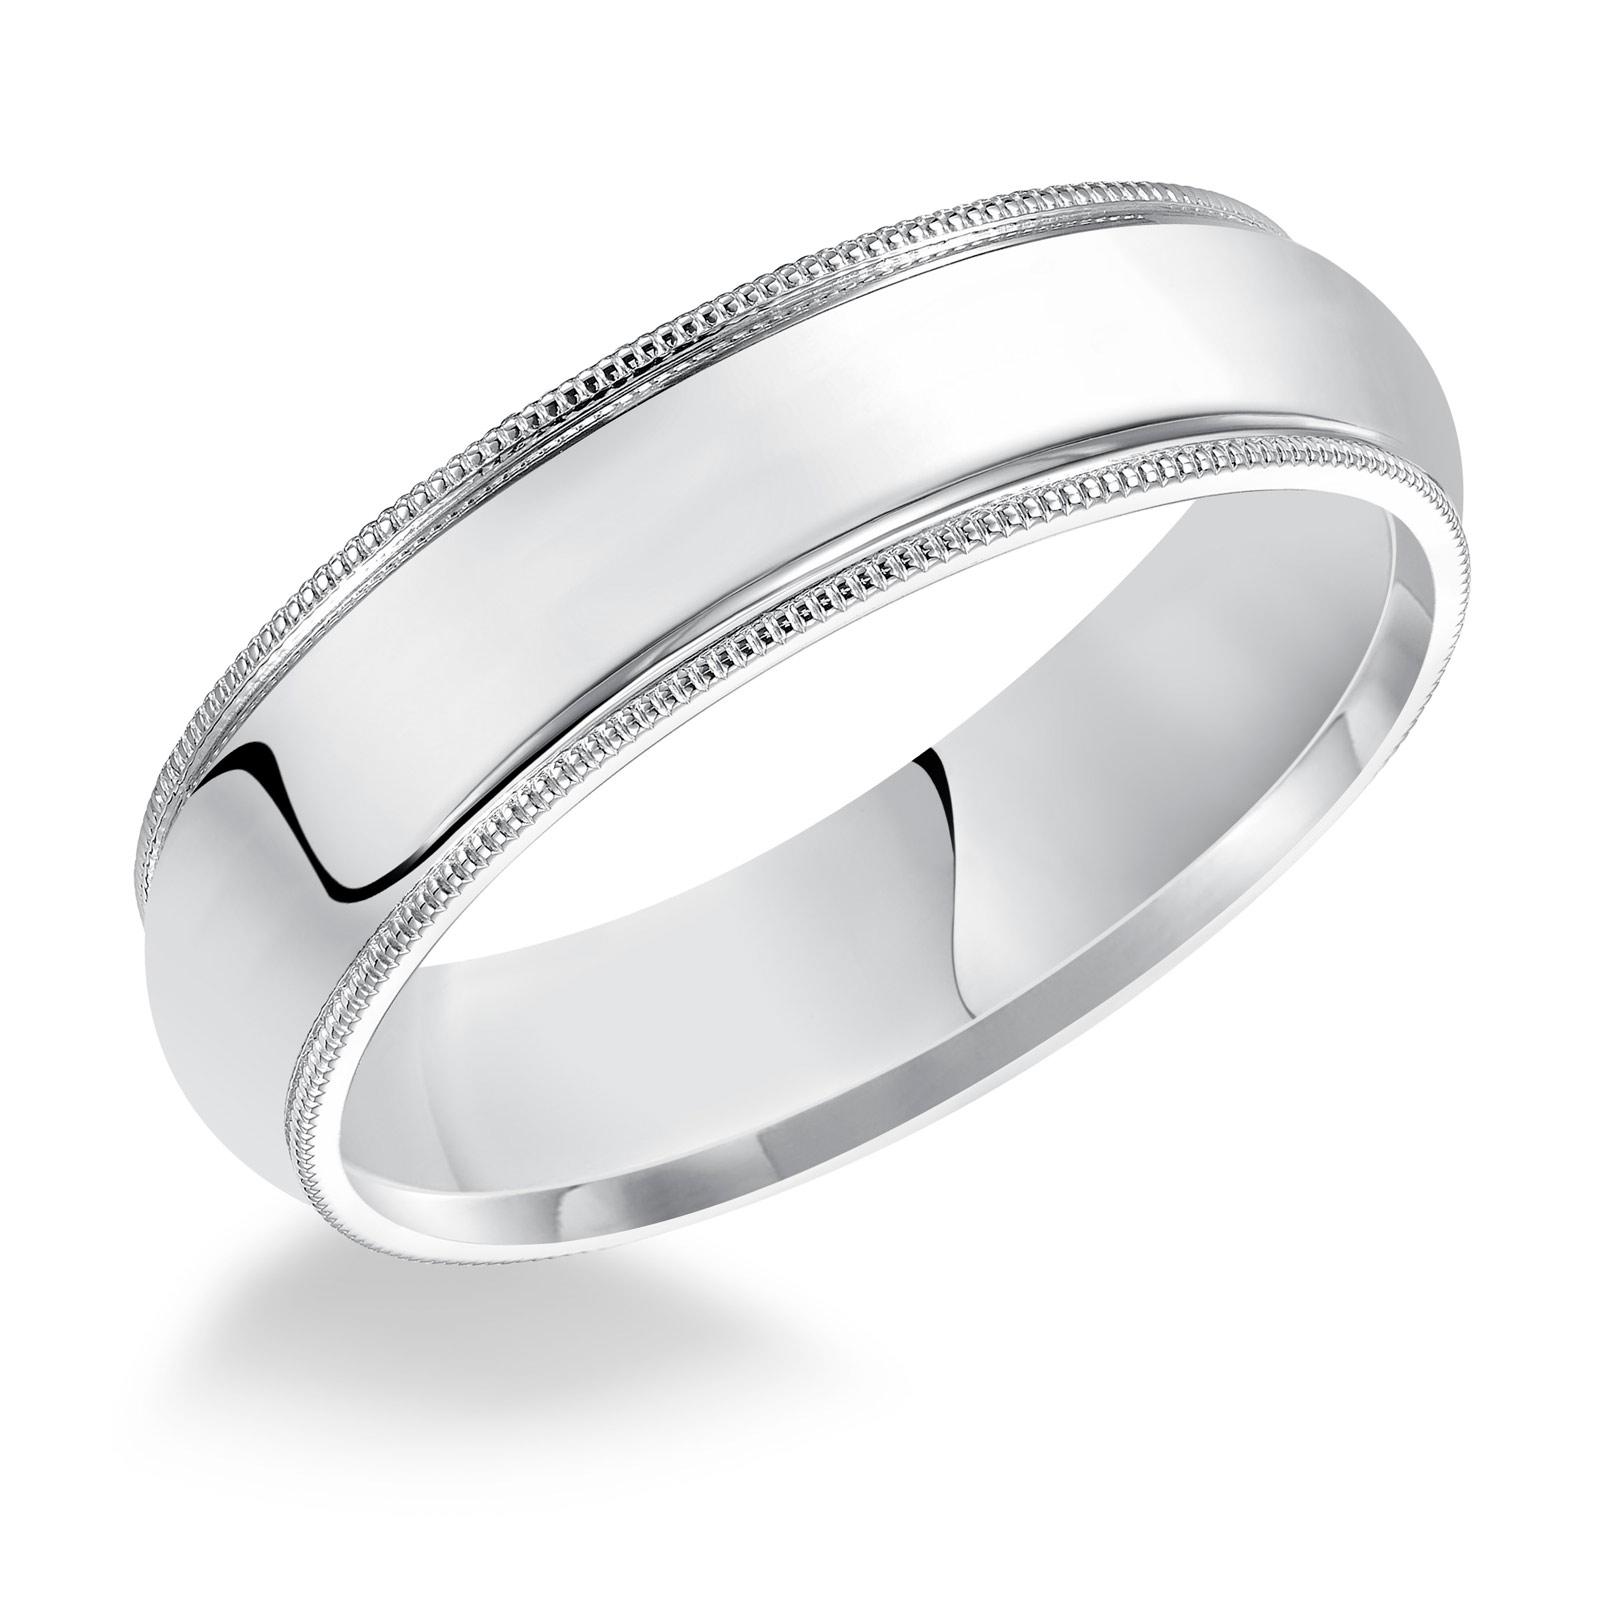 Goldman ring 01 mir060 g00 long island ny mens wedding for Long island wedding bands